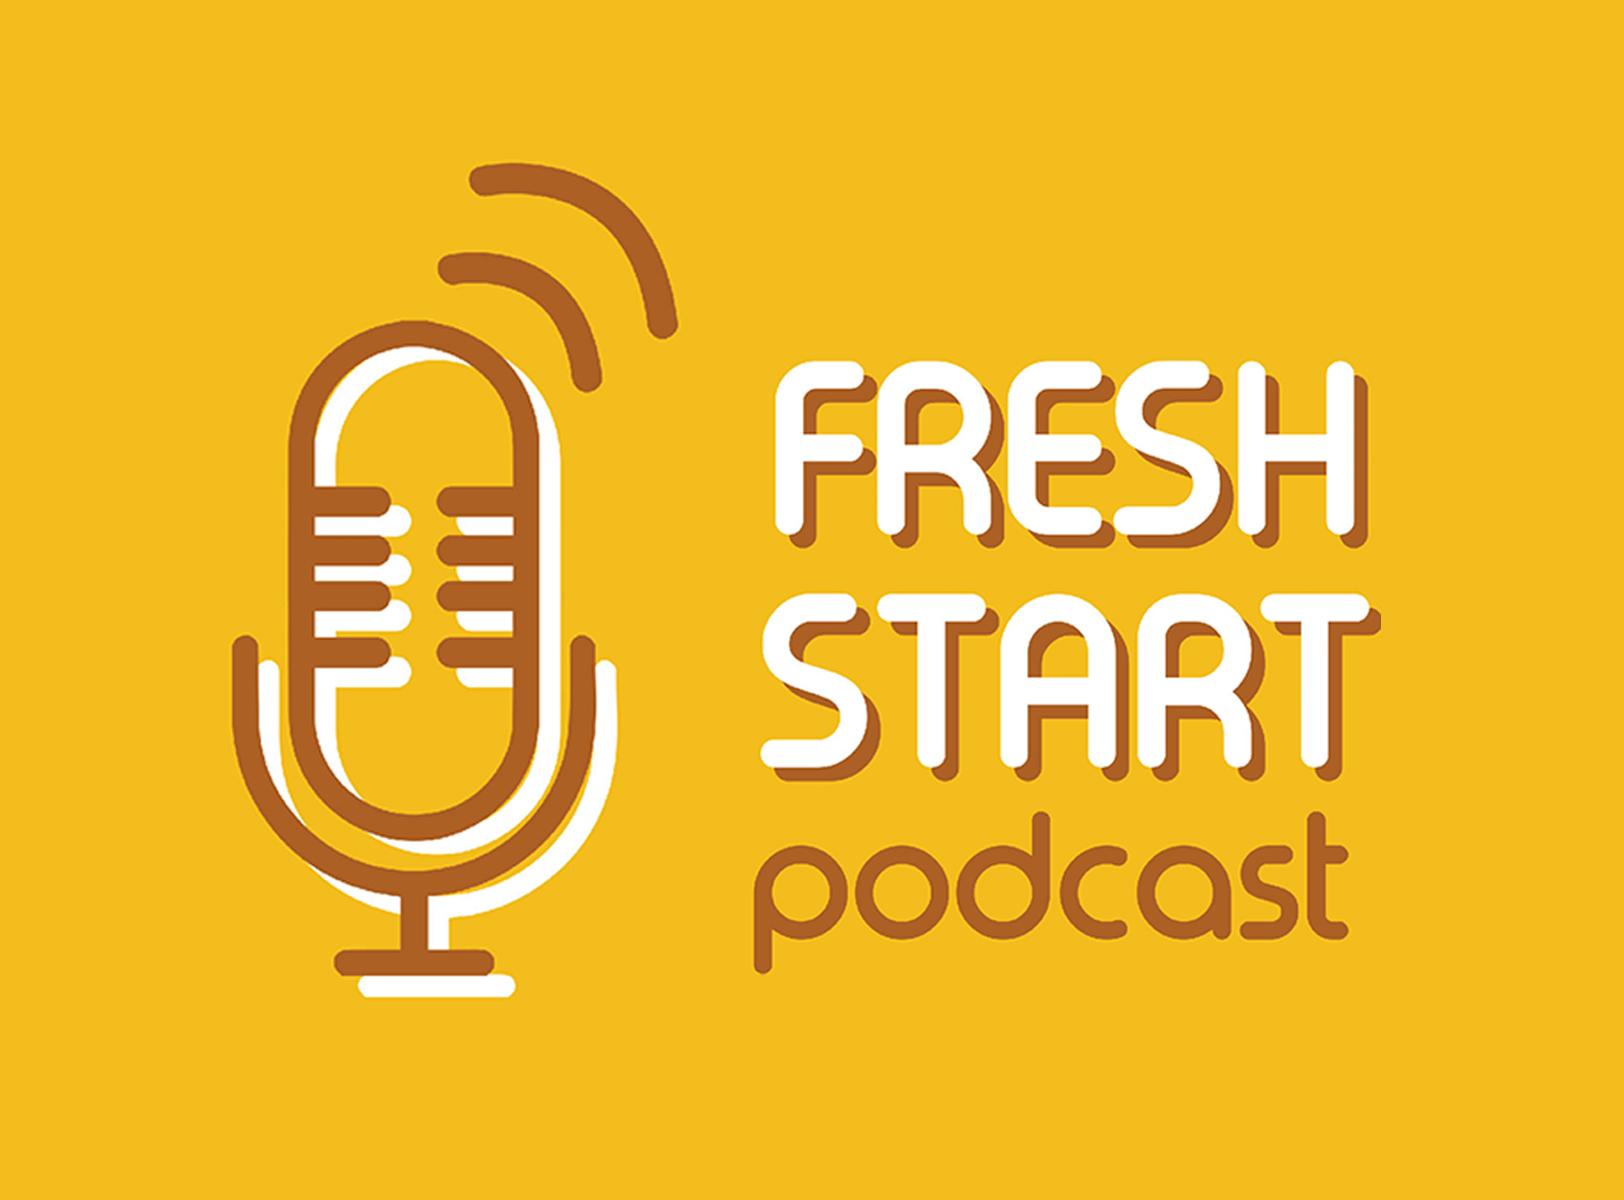 Fresh Start: Podcast News (1/15/2019 Tue.)